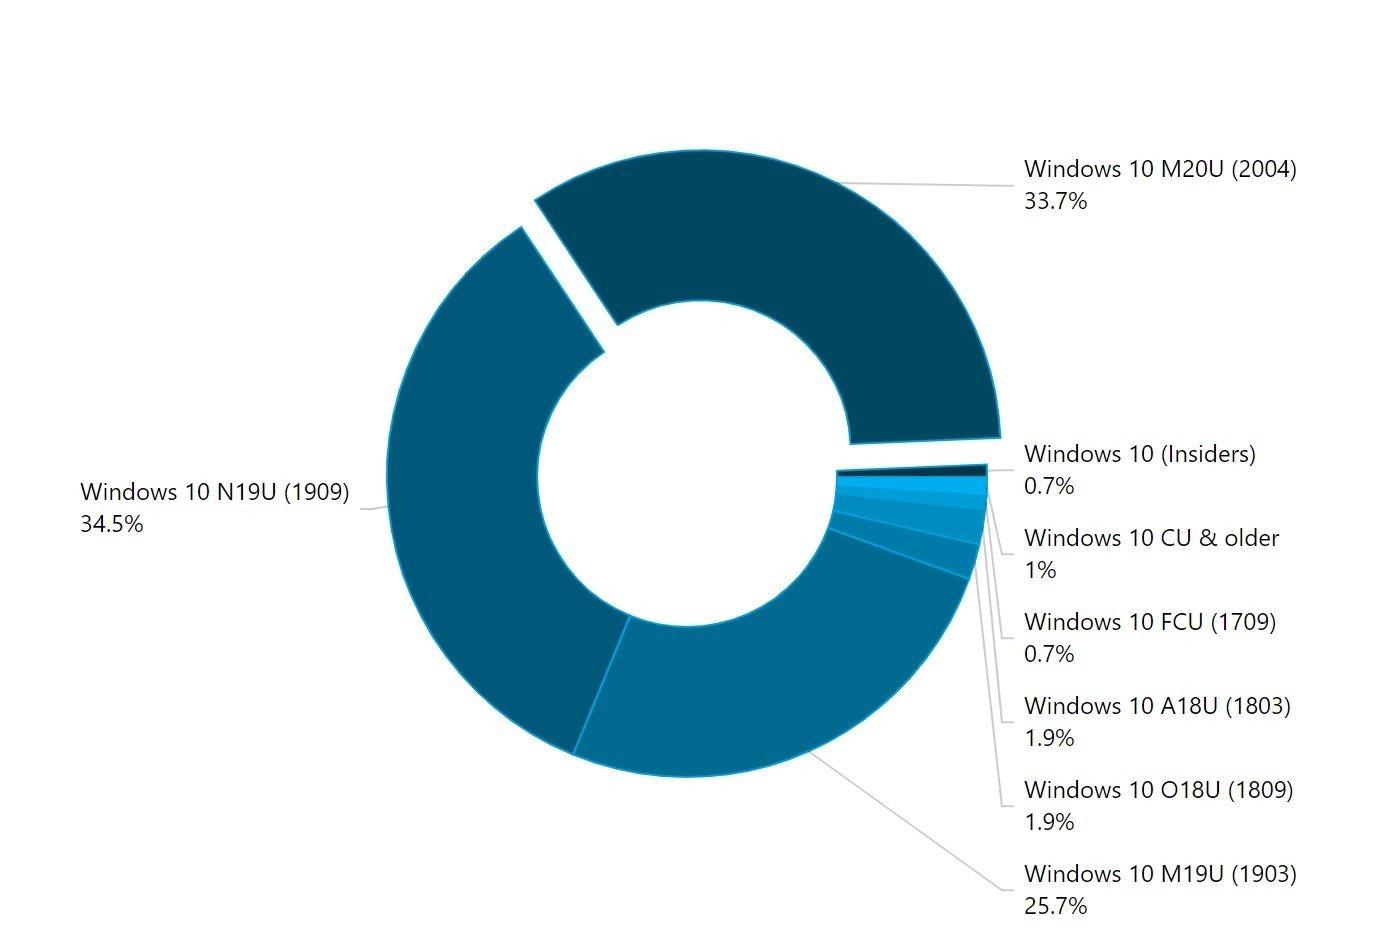 2004 - Windows 10 2004 μόνο 3 στους 10 τρέχουν την έκδοση